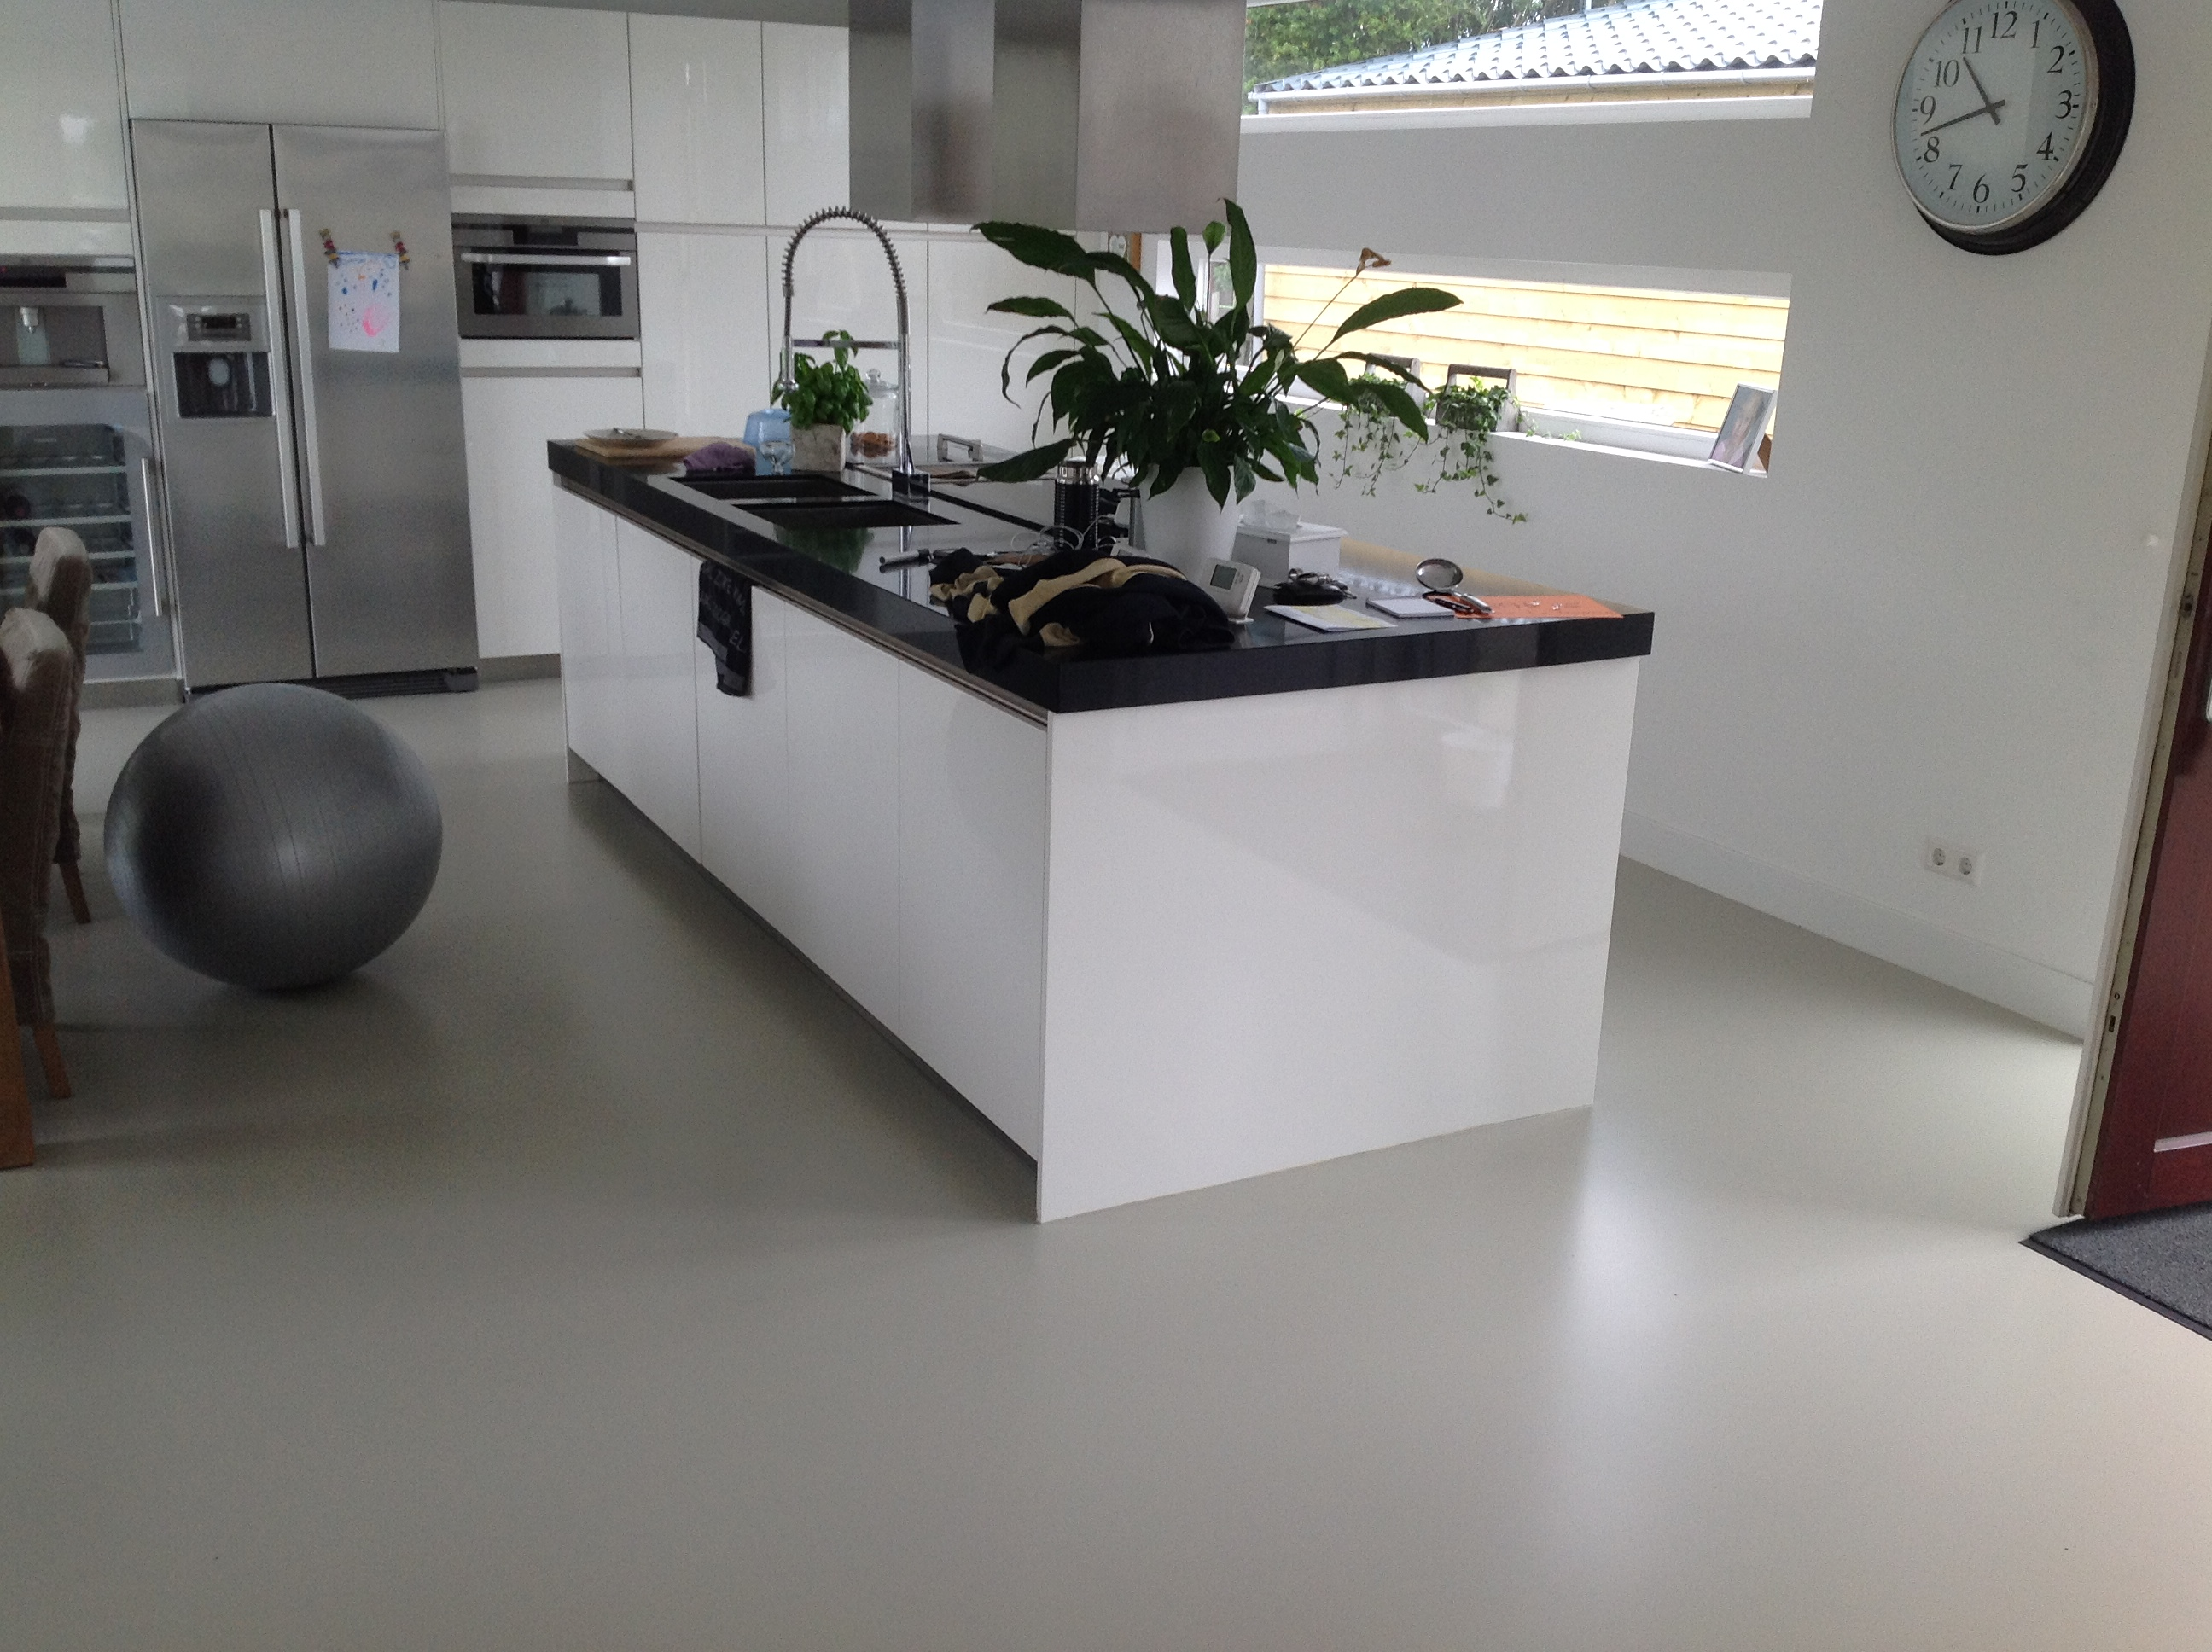 Welke Gietvloer Badkamer : Gietvloer cleaning uw gietvloer cleaning bedrijf!